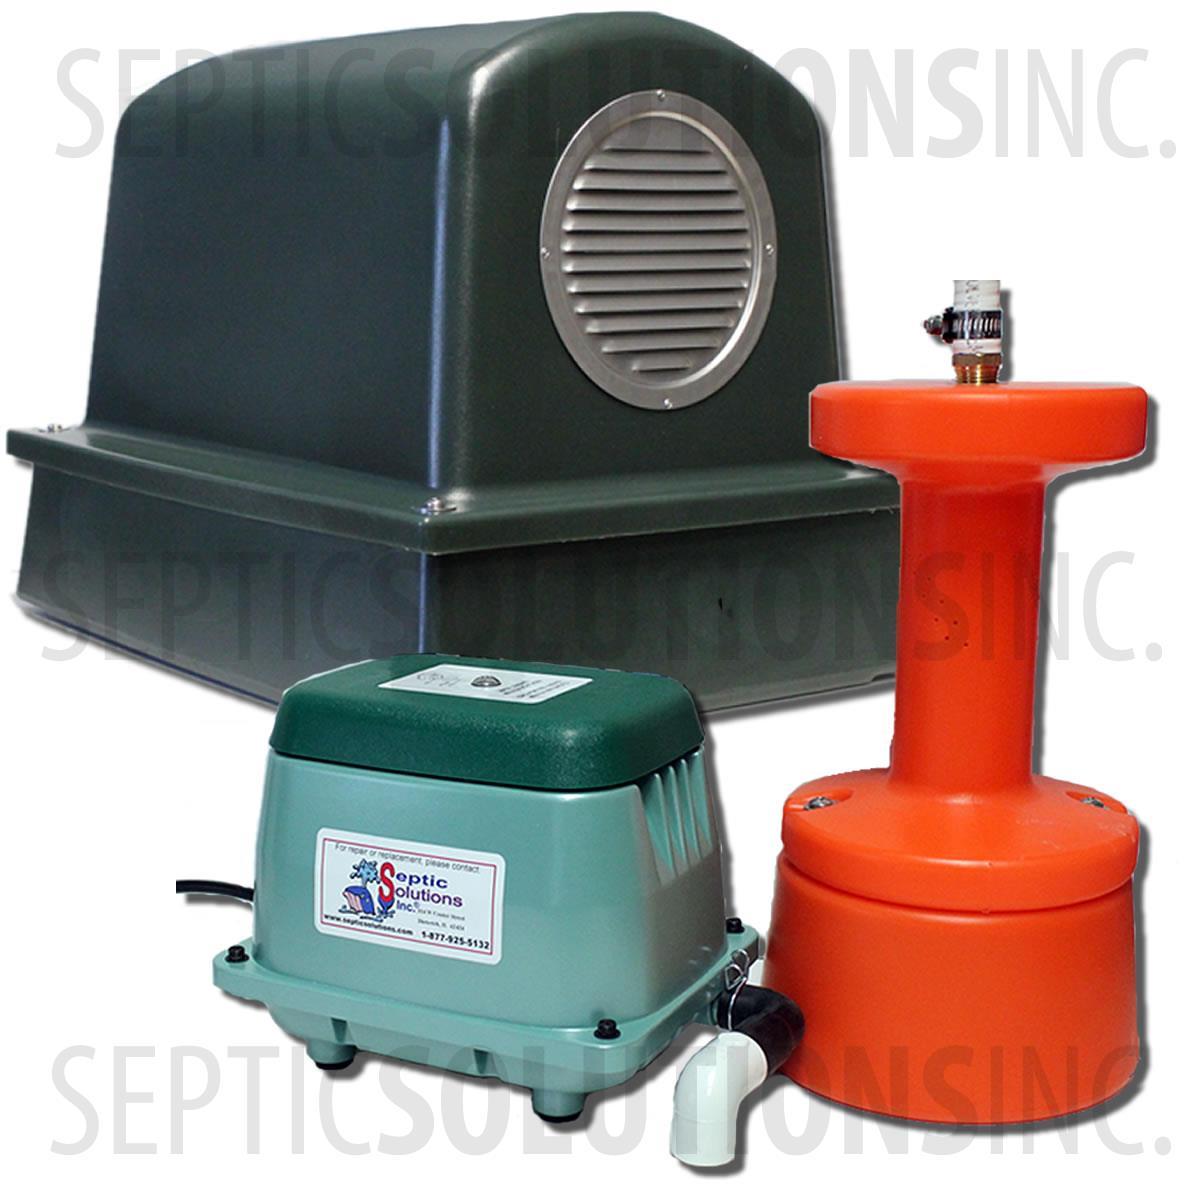 Septic Tank Air Blower Wiring Diagram 37 Images Pump Alarm Sepsaverpkgplus 1w600 Sepaerator Saver Package Plus Aerator Convert Your